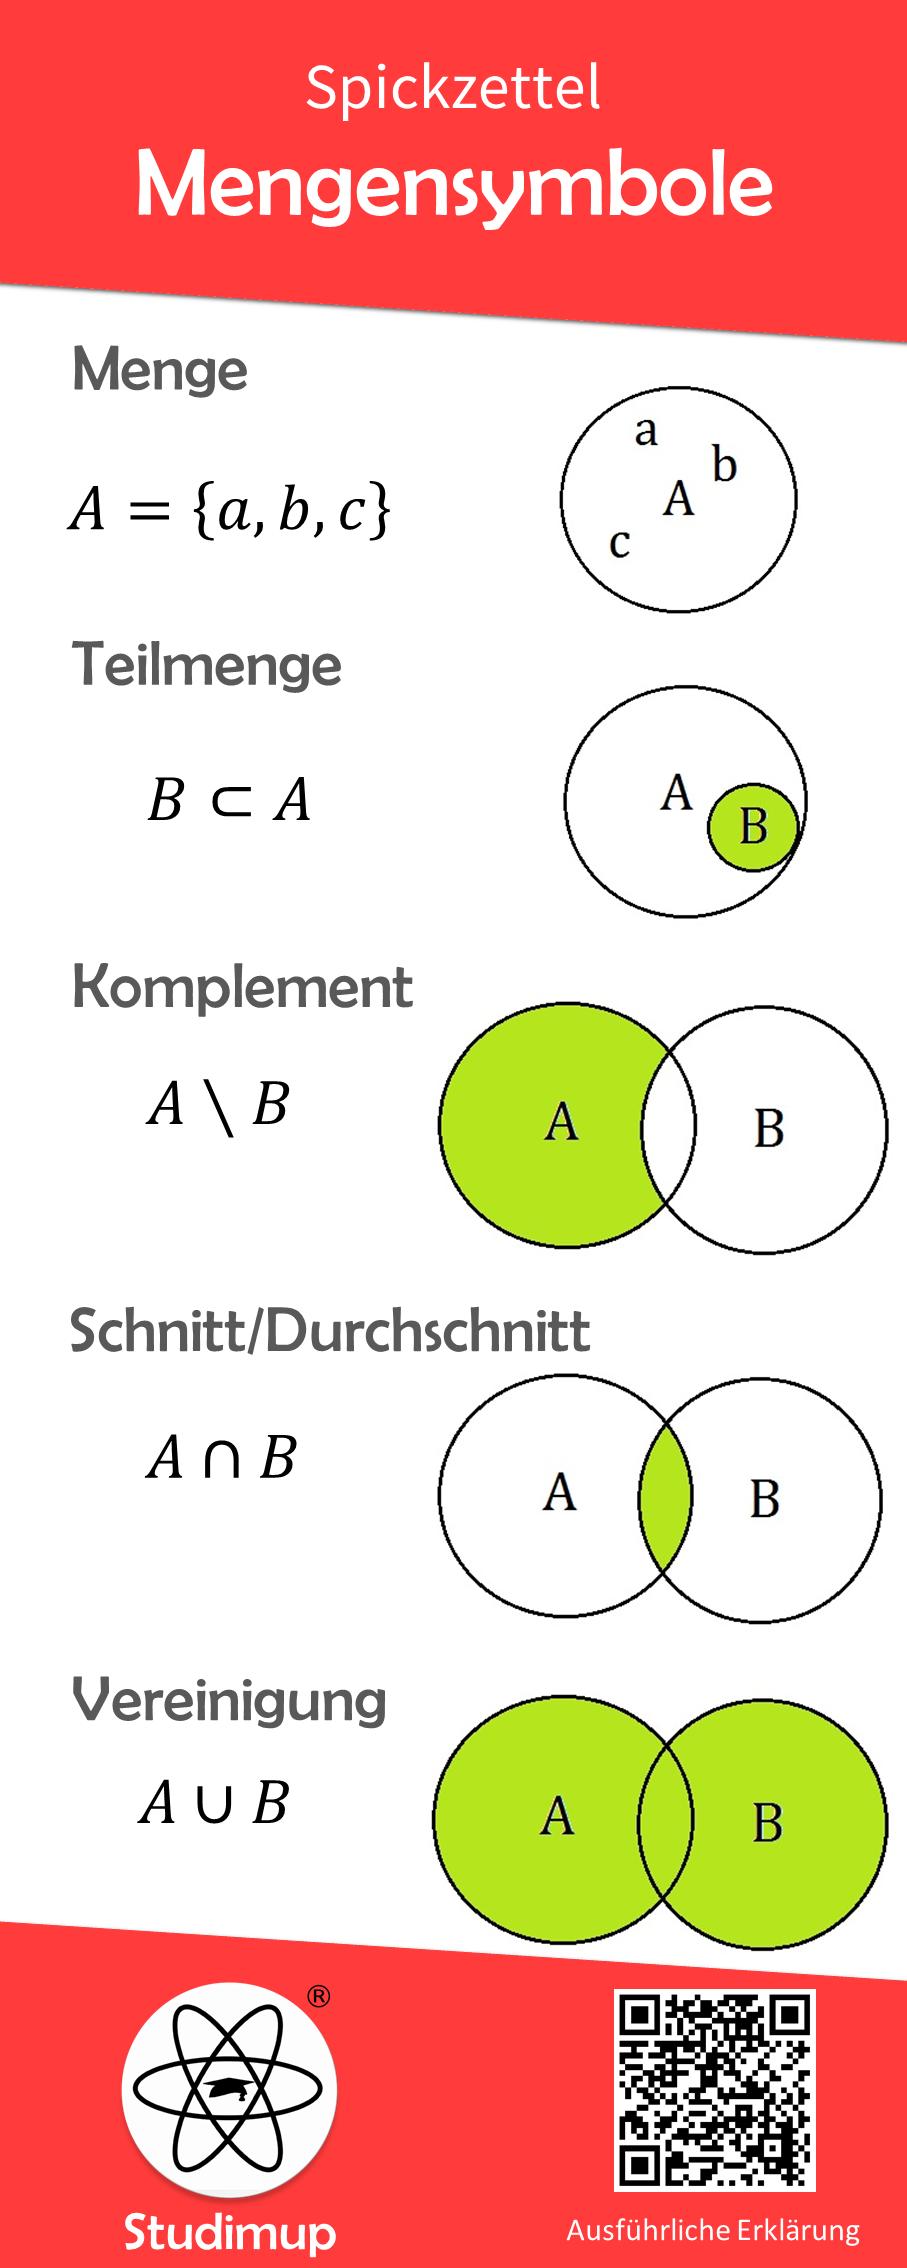 Mengensymbole Spickzettel Spickzettel Mathe Formeln Nachhilfe Mathe